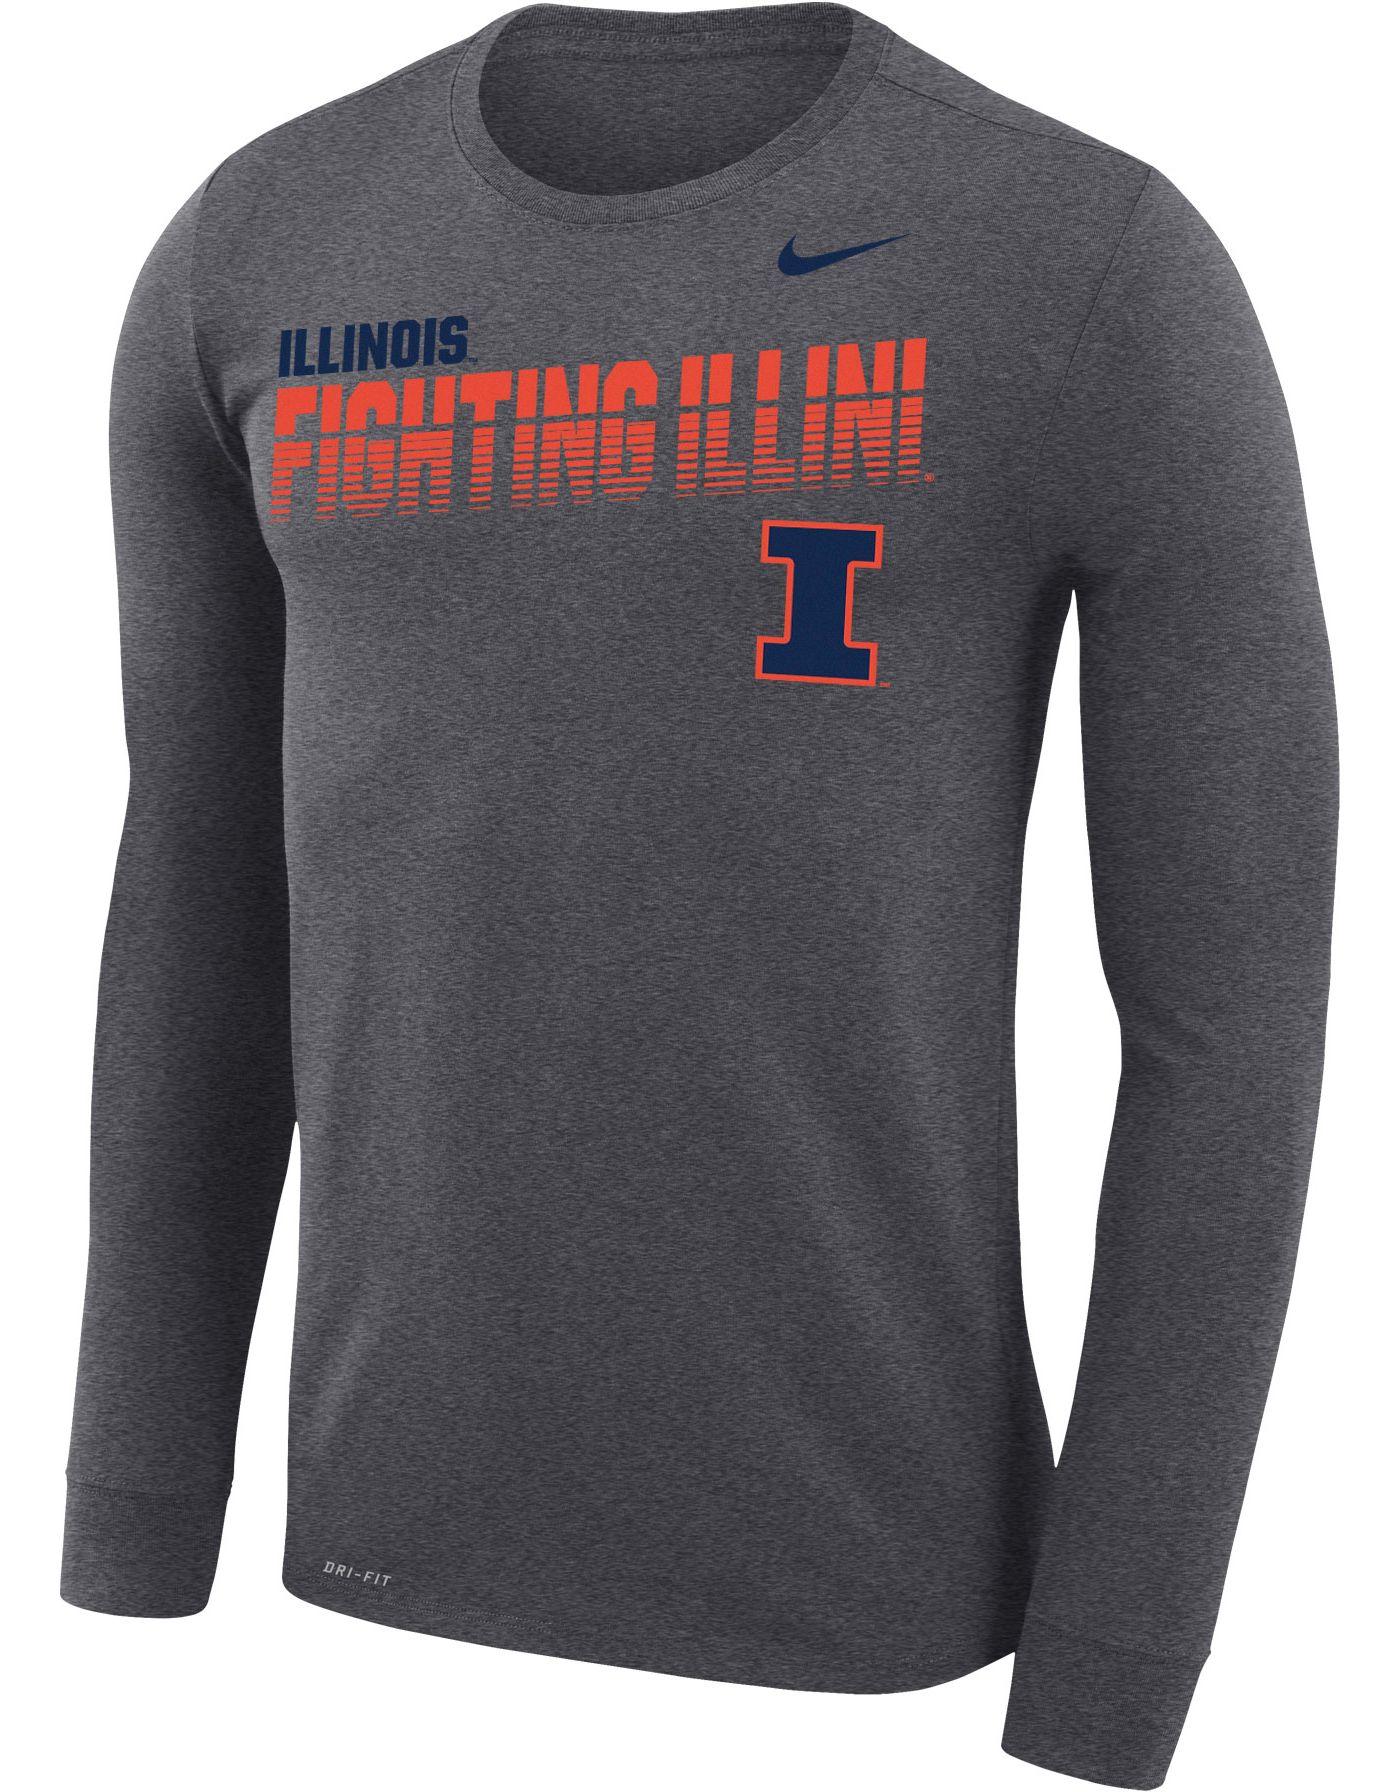 Nike Men's Illinois Fighting Illini Grey Legend Football Sideline Long Sleeve T-Shirt